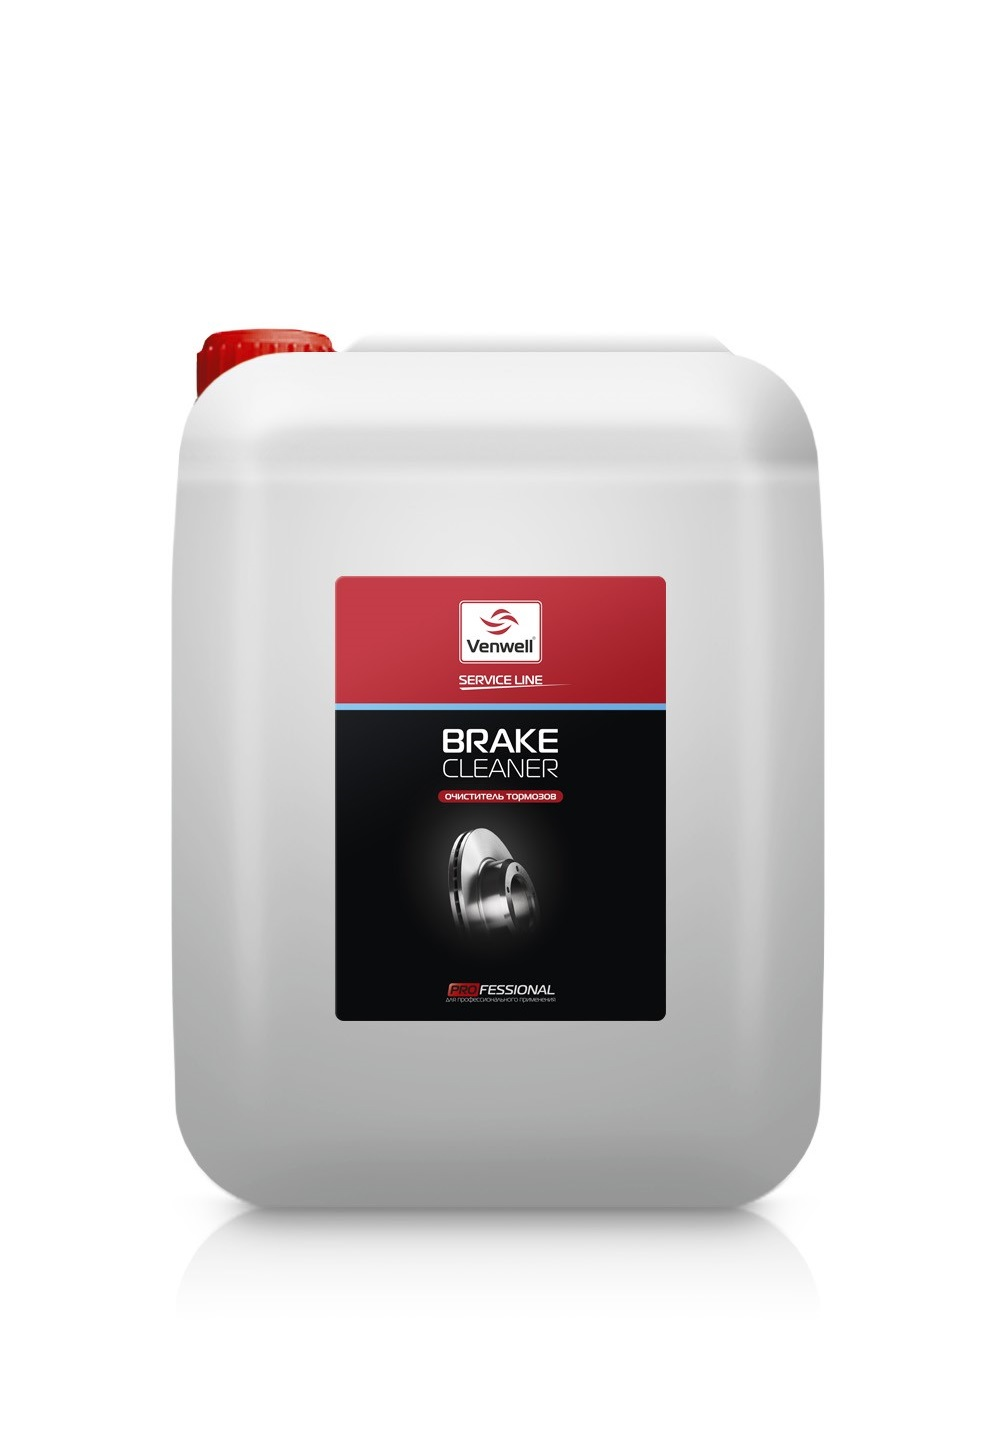 Venwell Очиститель тормозов Brake Cleaner 20 л